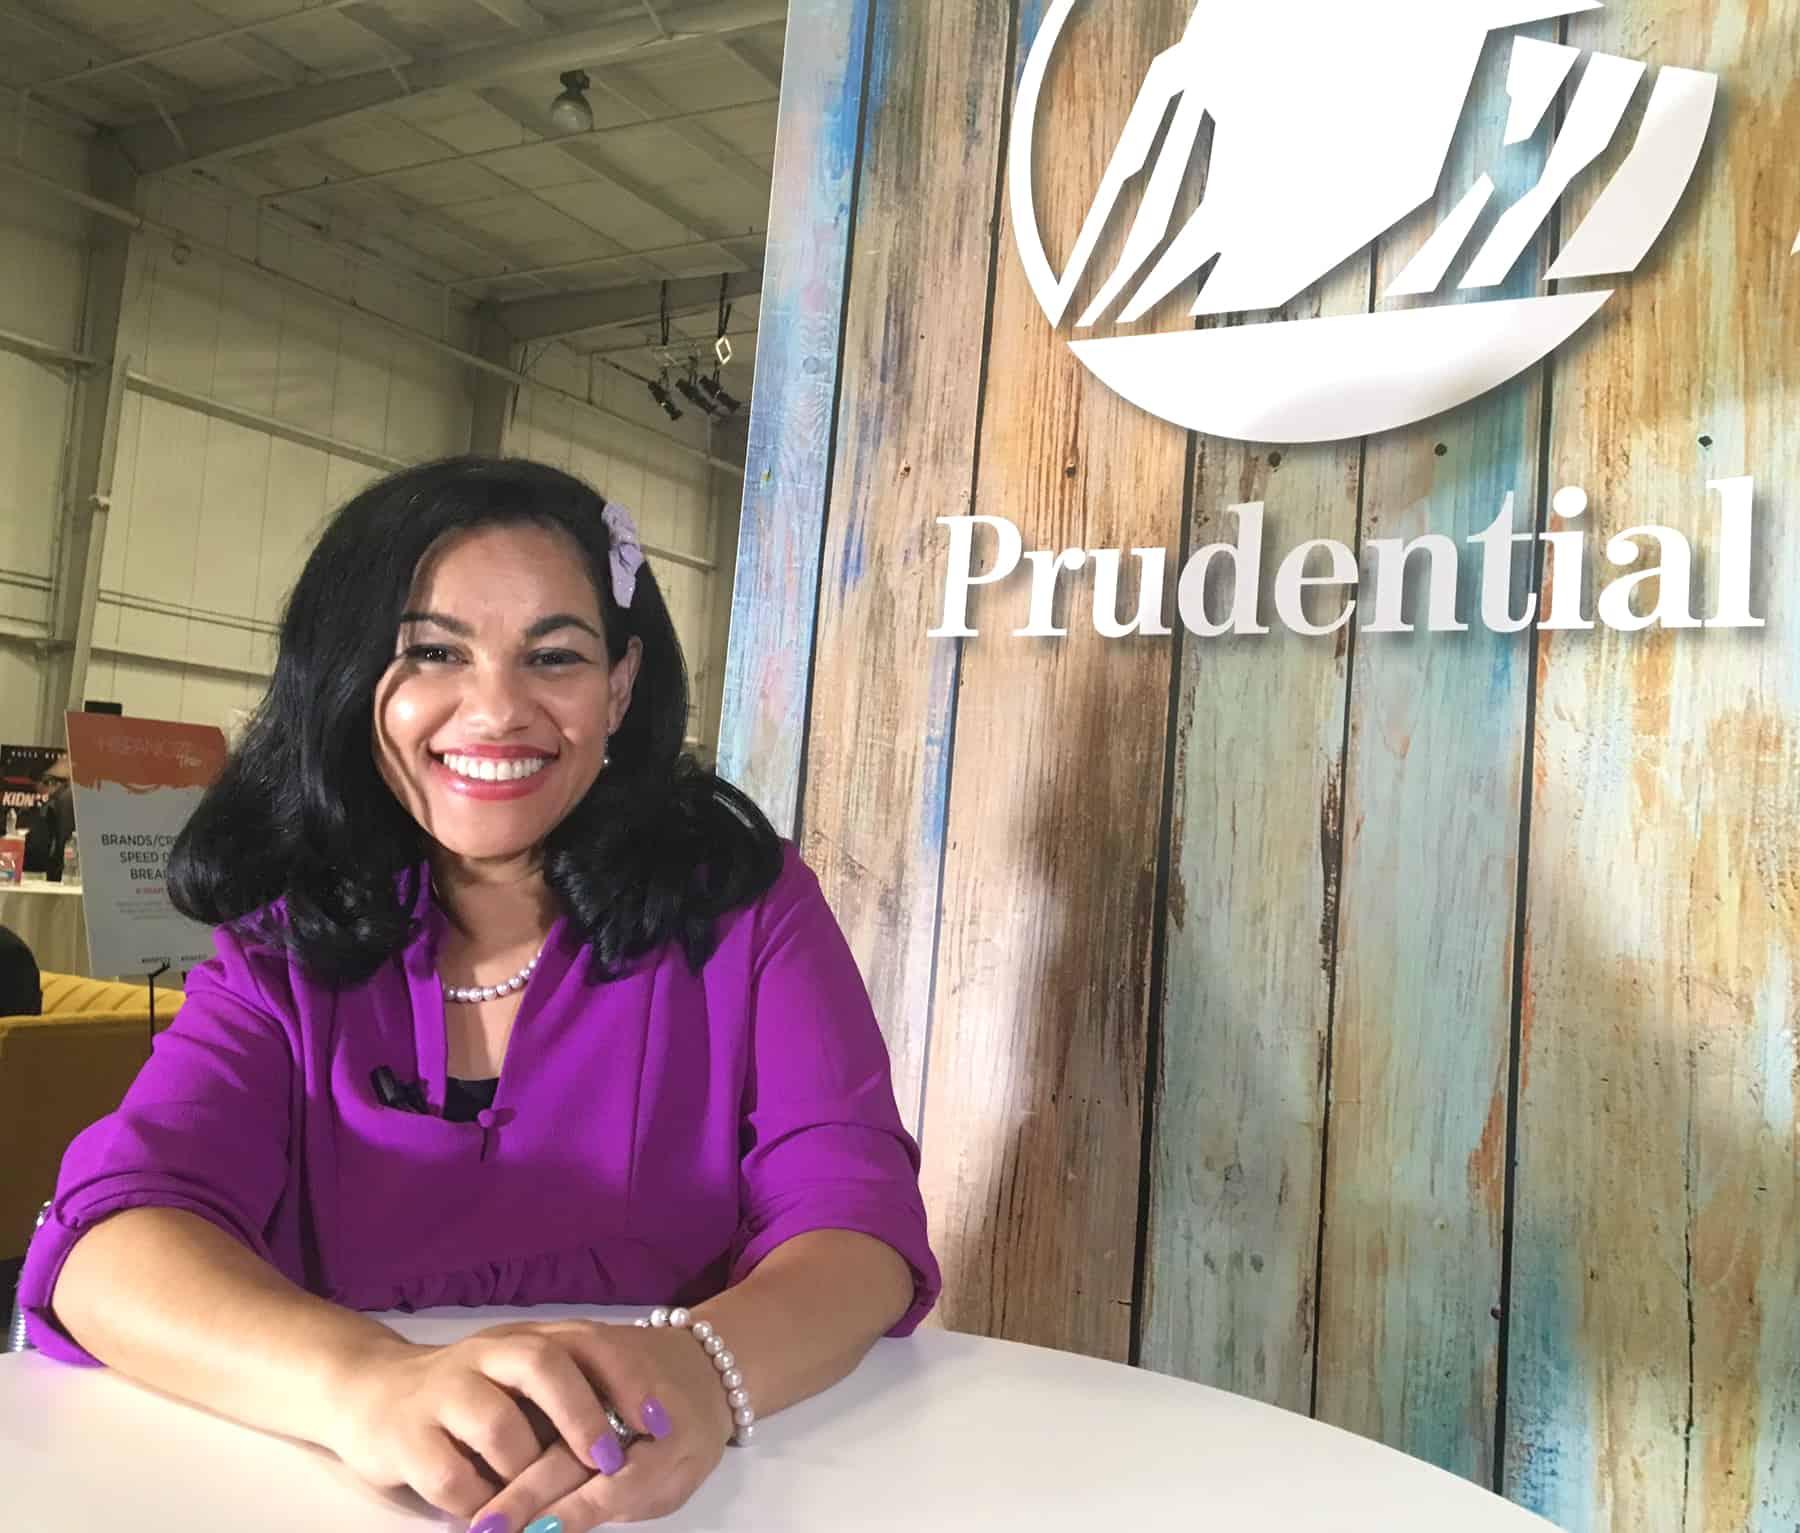 Influencer Elayna Fernandez ~ The Positive MOM | Prudential Ambassador at Hispanicize Texas weekend in Houston